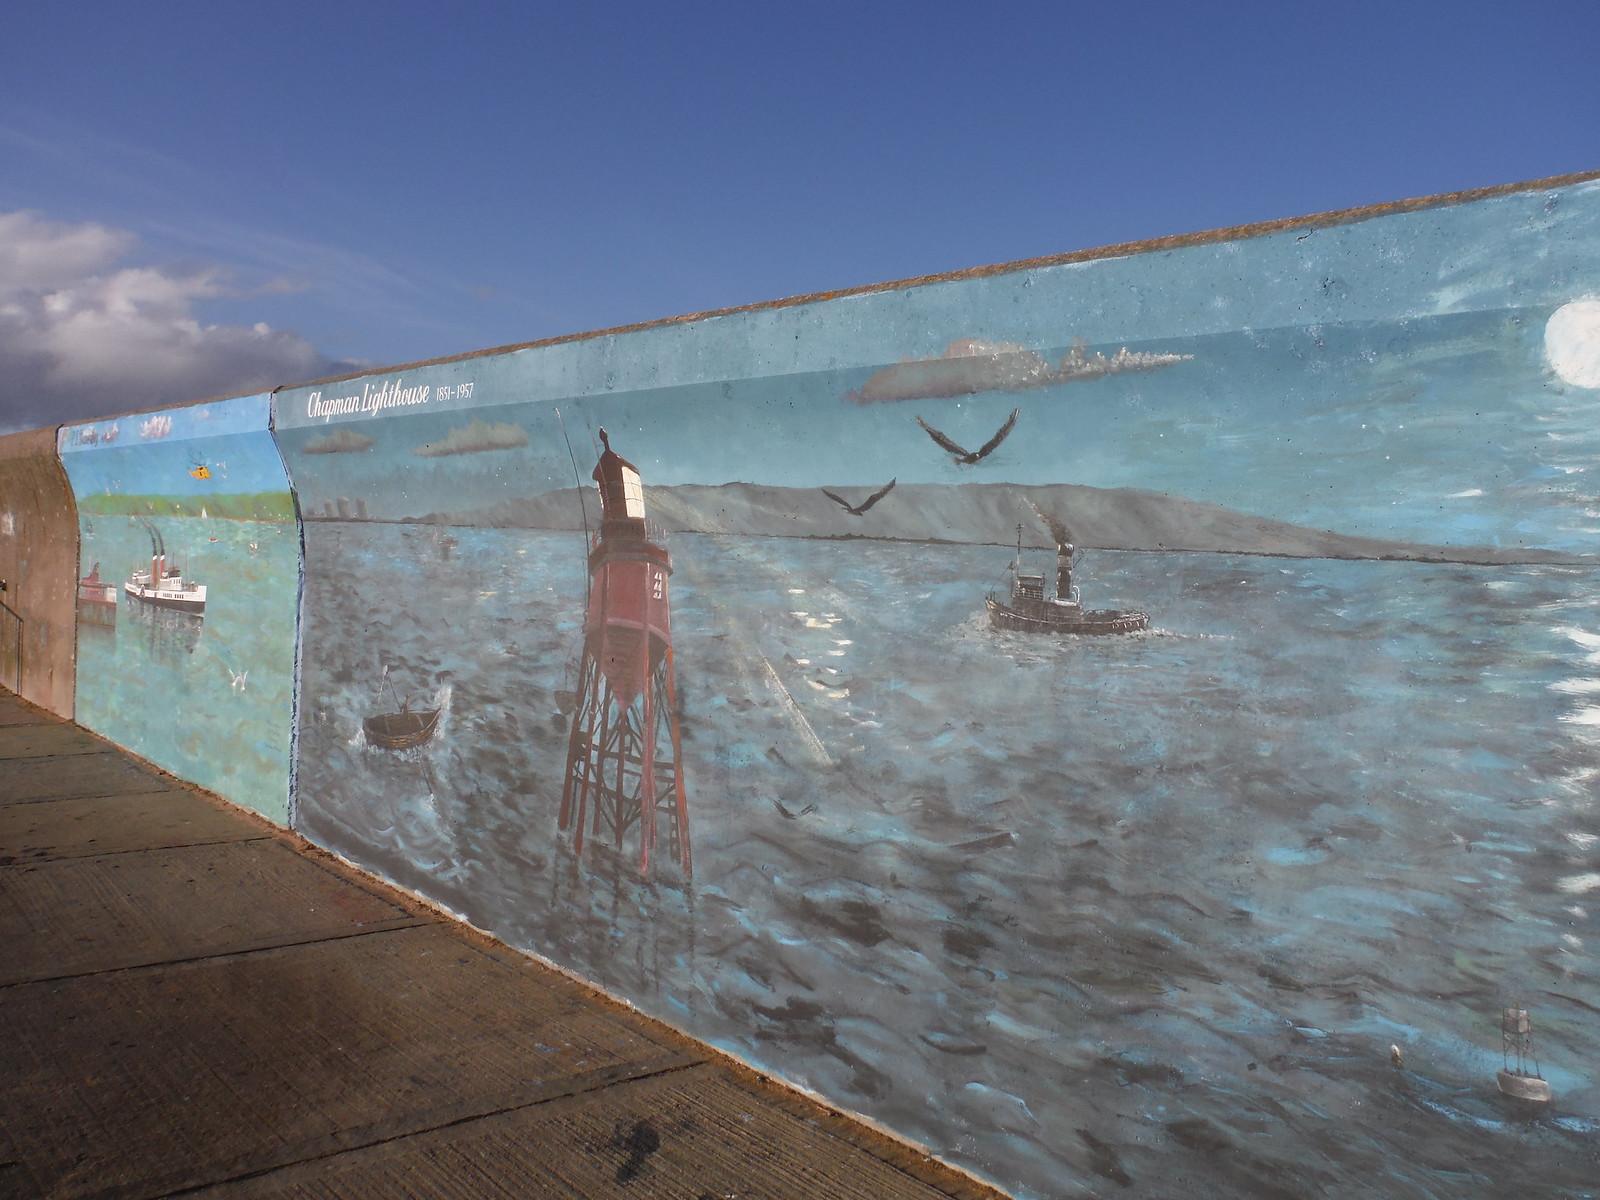 Chapman Lighthouse and MS Waverley murals, riverfront, Canvey Island SWC Walk 258 Benfleet Circular (via Canvey Island)